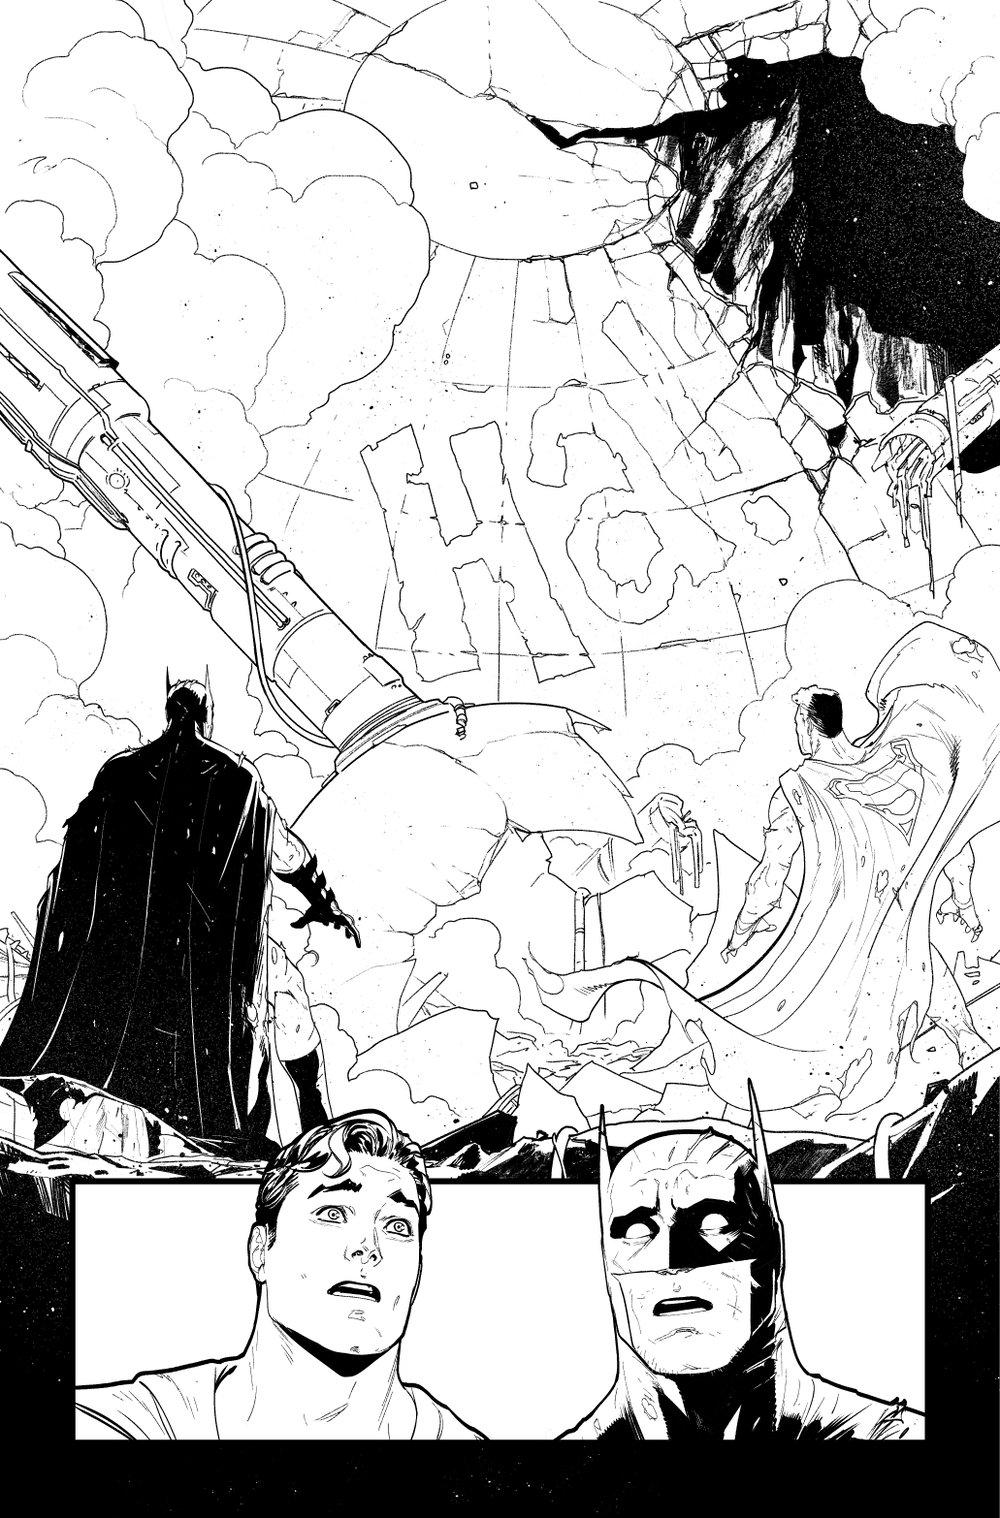 Image of BATMAN/SUPERMAN #5 p.20 ARTIST'S PROOF